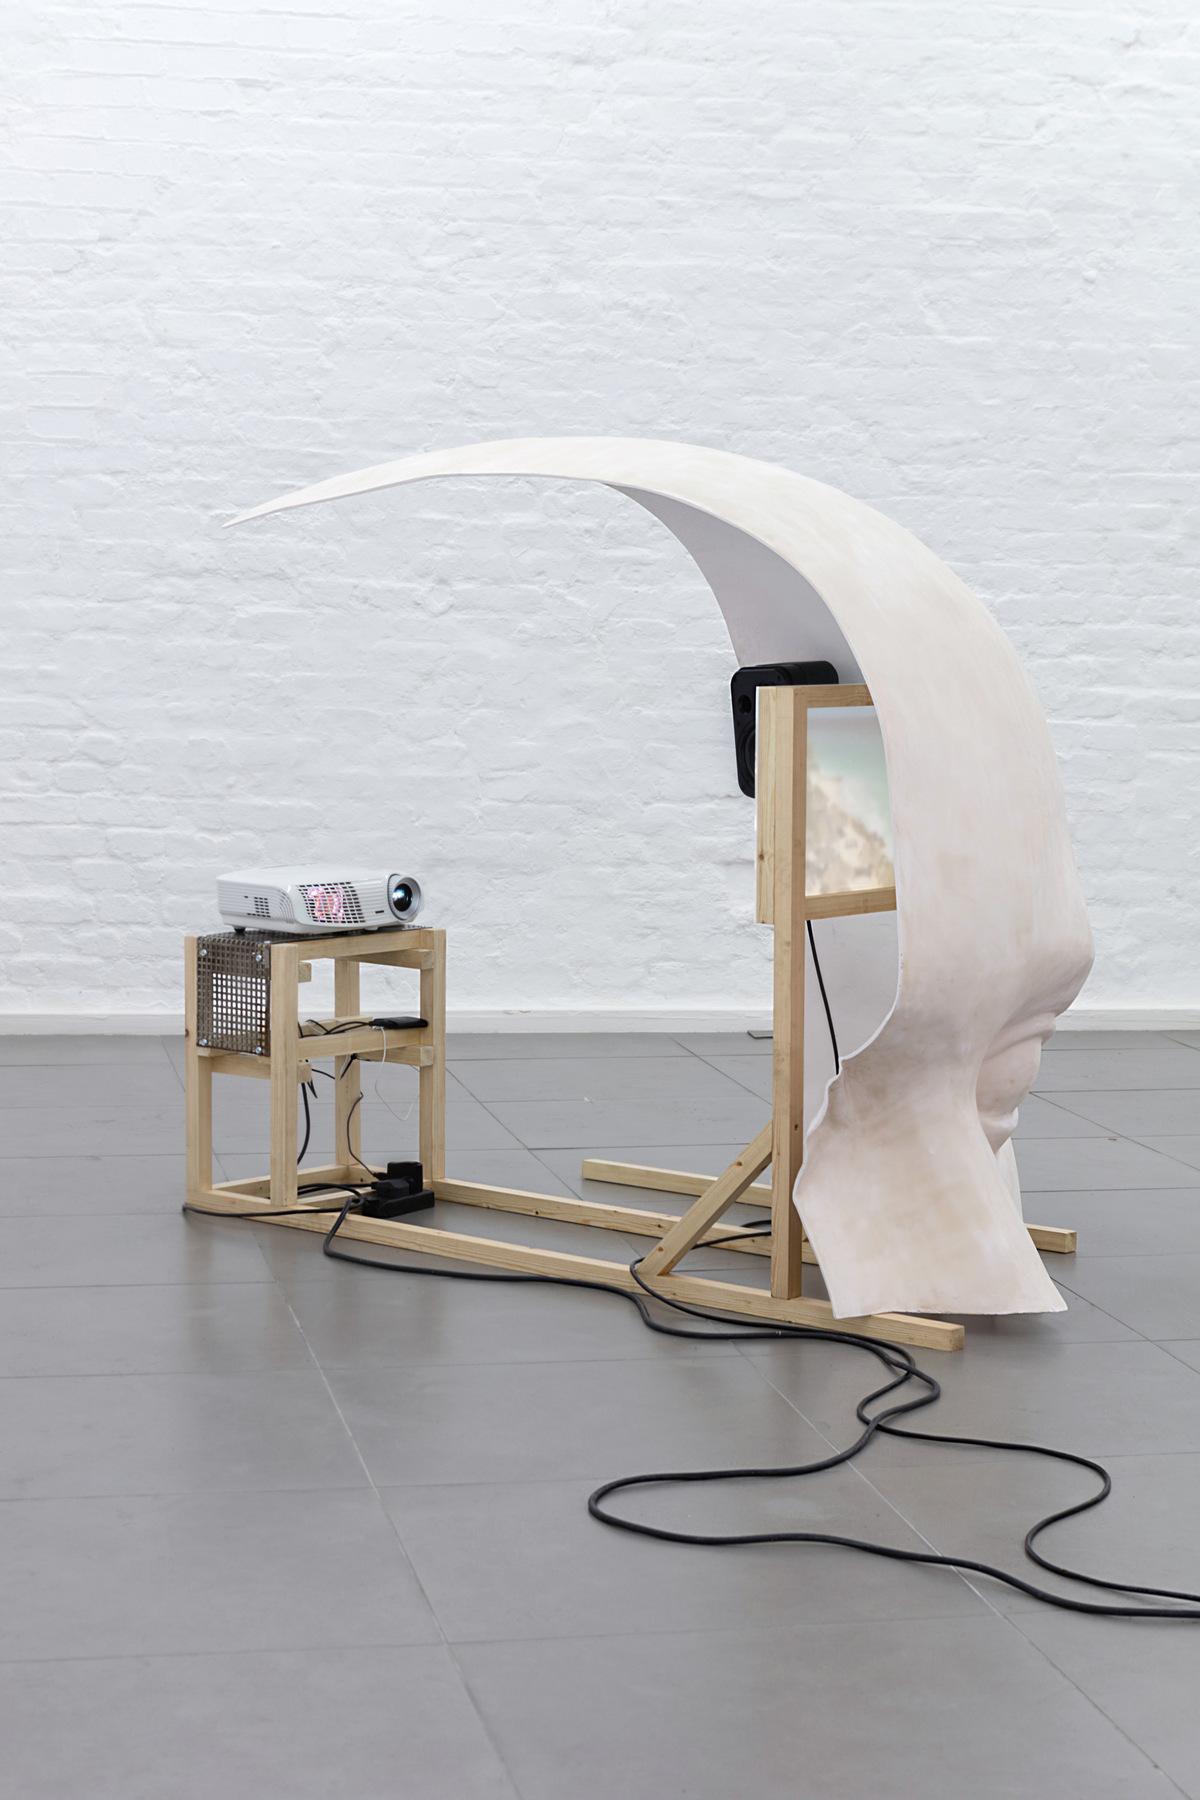 11. Anne de Vries, SUBMISSION 2015, wood, metal, fibreglass resin, audio, video